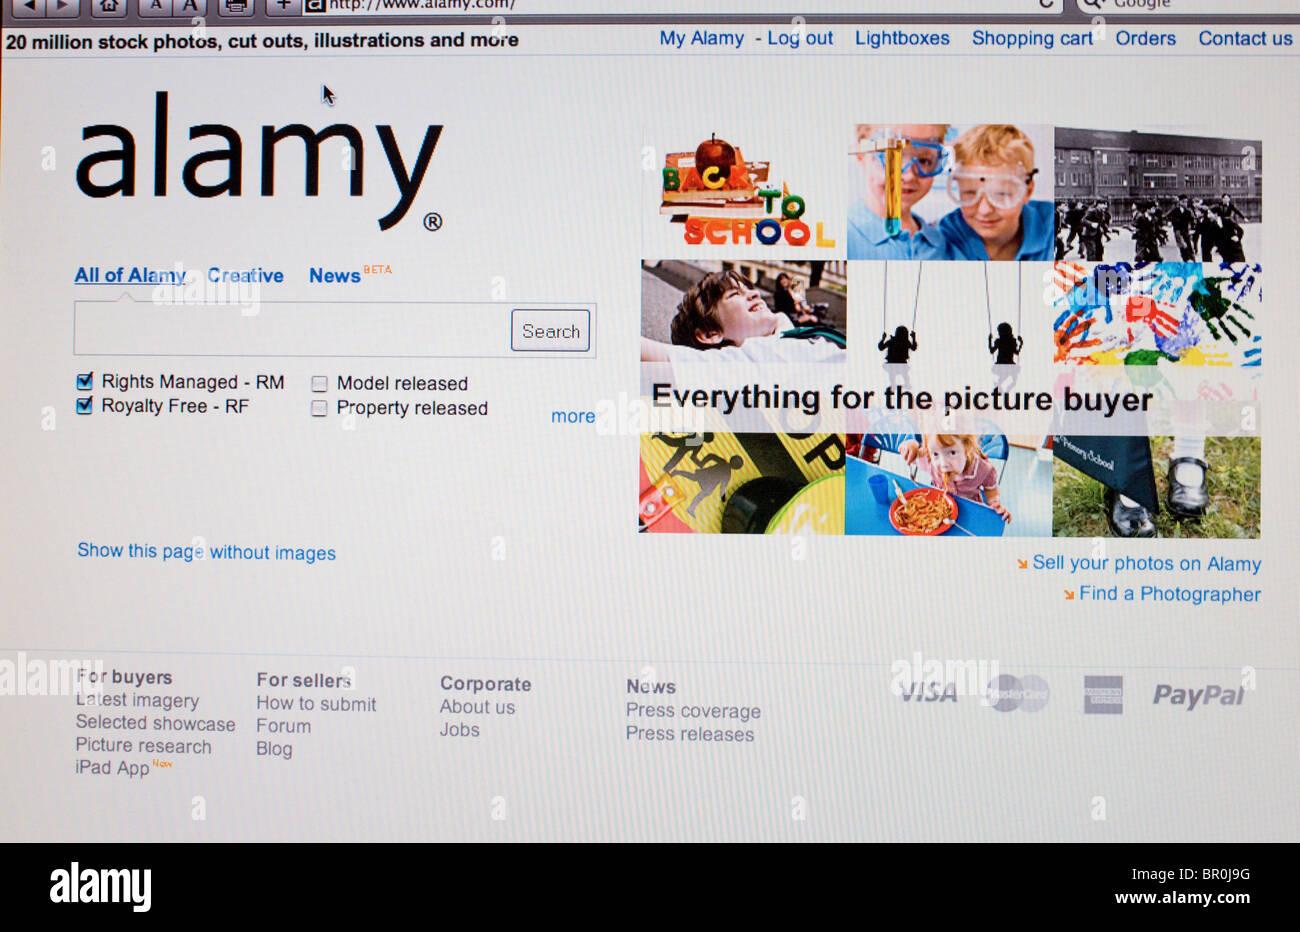 alamy Screenshot - 20 million images landmark - Stock Image